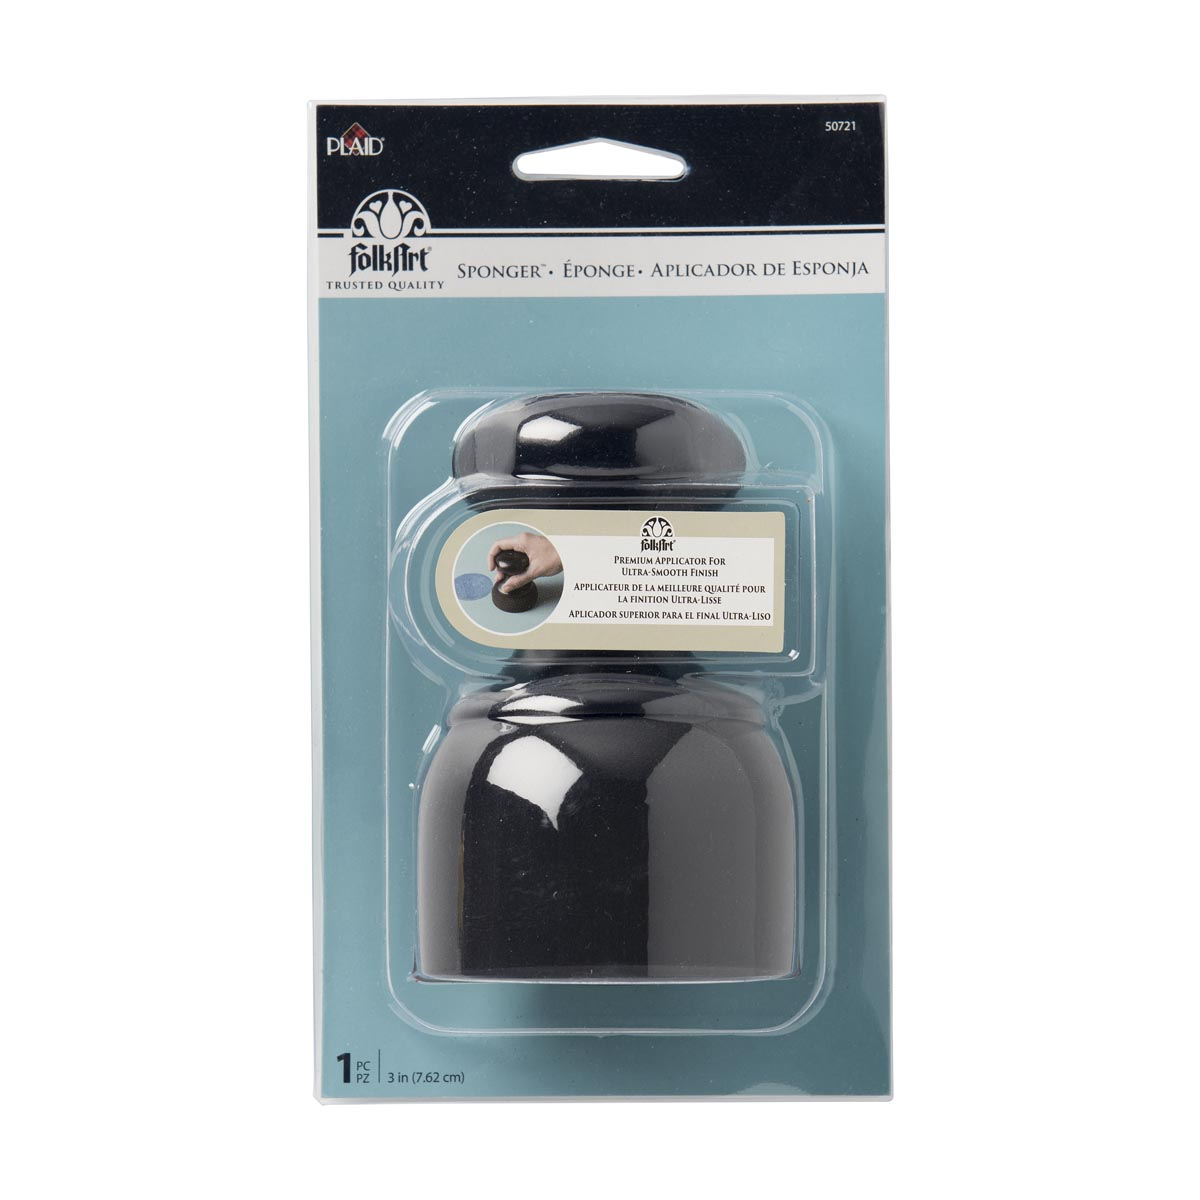 FolkArt ® Painting Tools - Sponger™ 3 inch - 50721